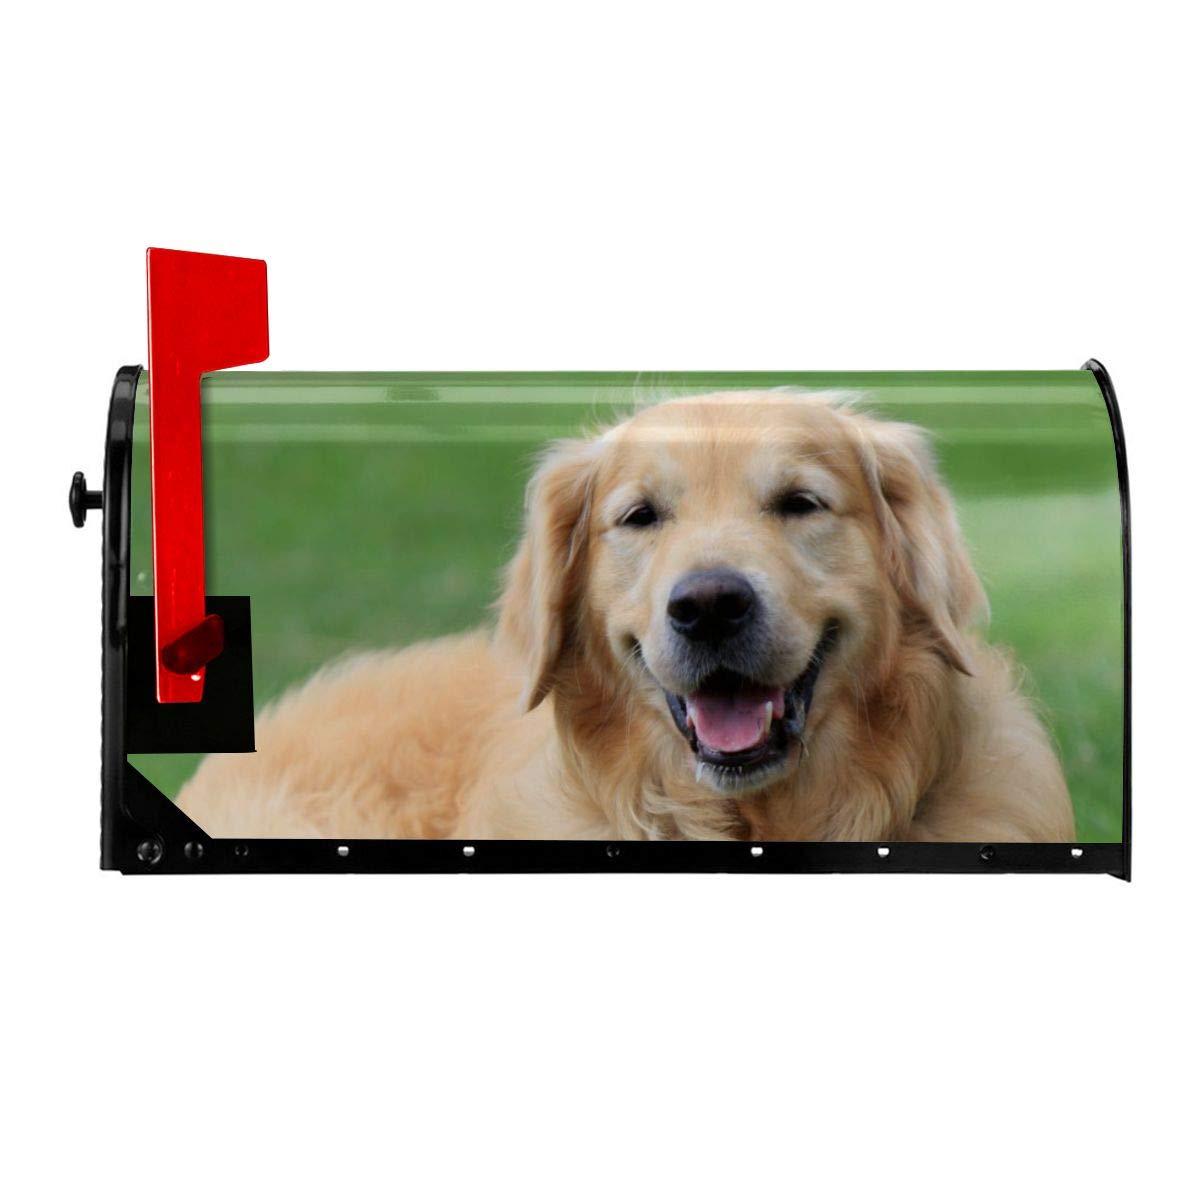 25.5 W X 21 L HFVNTXr Happy Golden Retriever Dog Standard Size Mailbox Set for Outdoor Garden Decoration 21 W X18 L